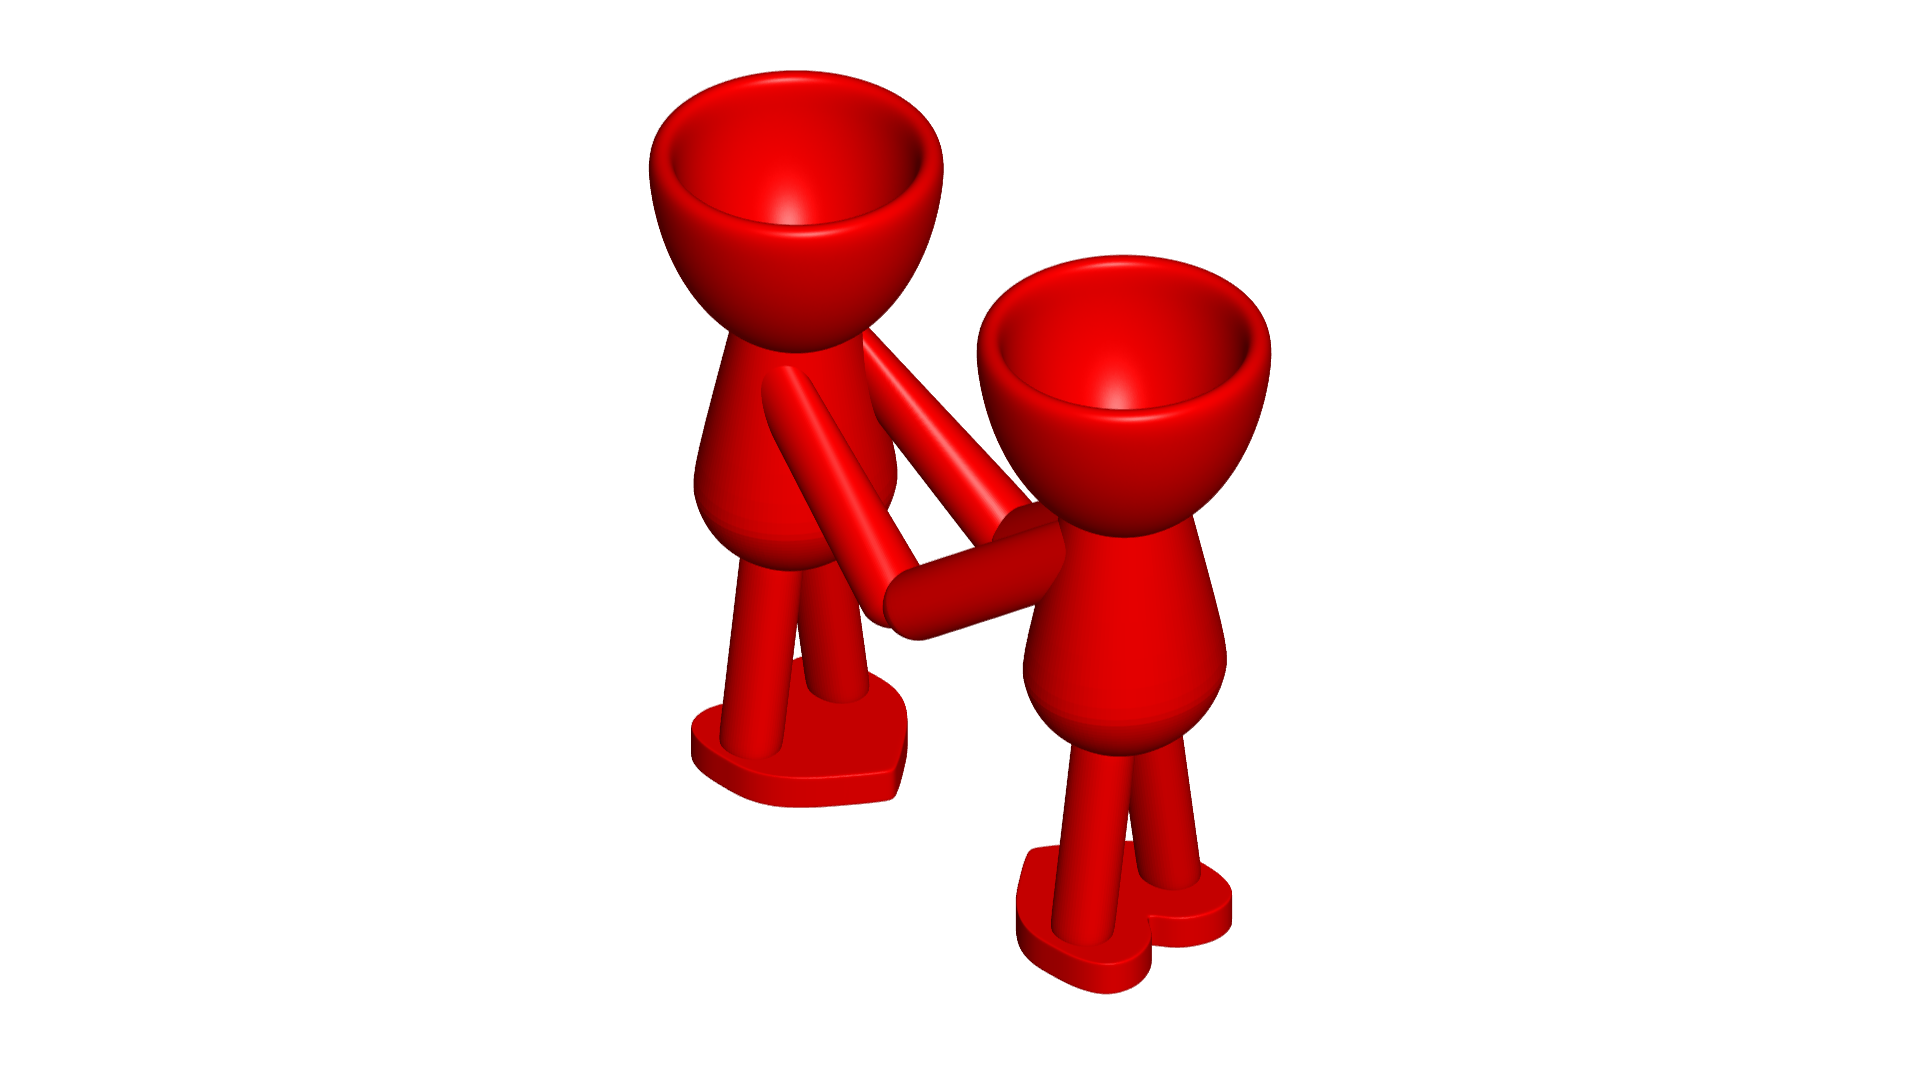 Enamorados_N5_Rojo_1.png Download free STL file Maceta Florero Robert N° 5 VASE FLOWERPOT ROBERT IN LOVE • Object to 3D print, PRODUSTL56